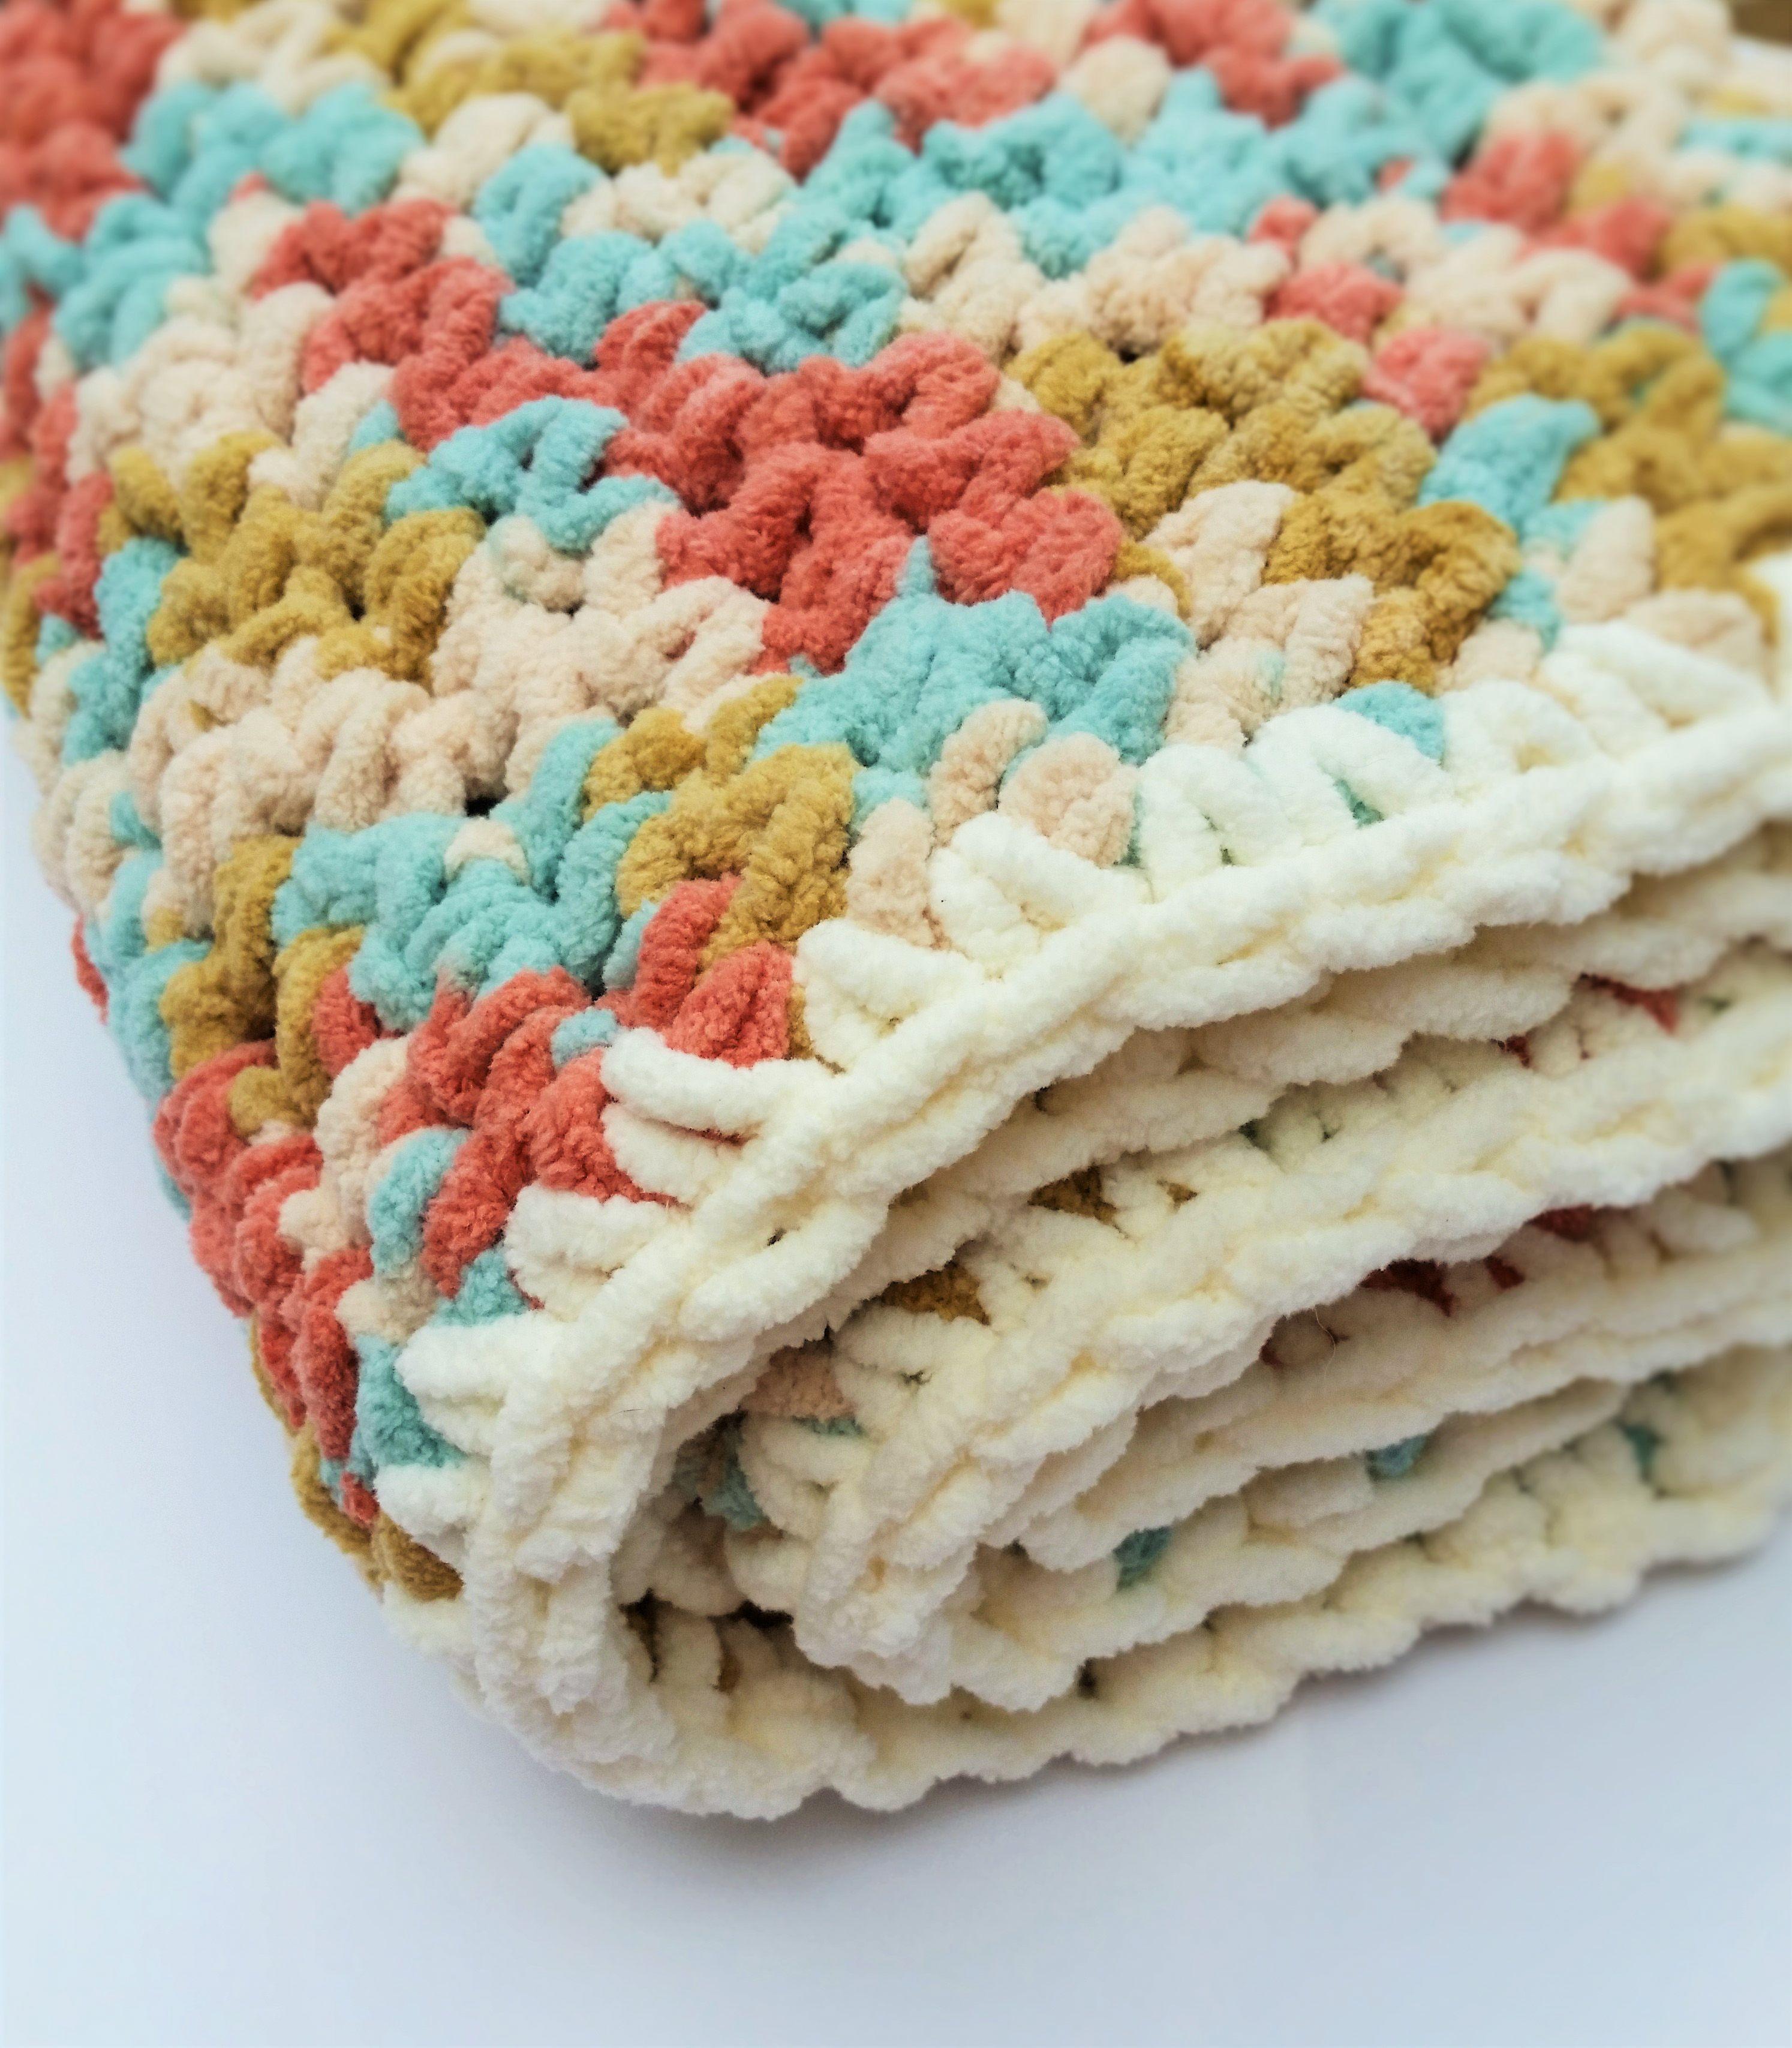 Easy Crochet Baby Blanket Pattern | Blanket, Patterns and Crochet